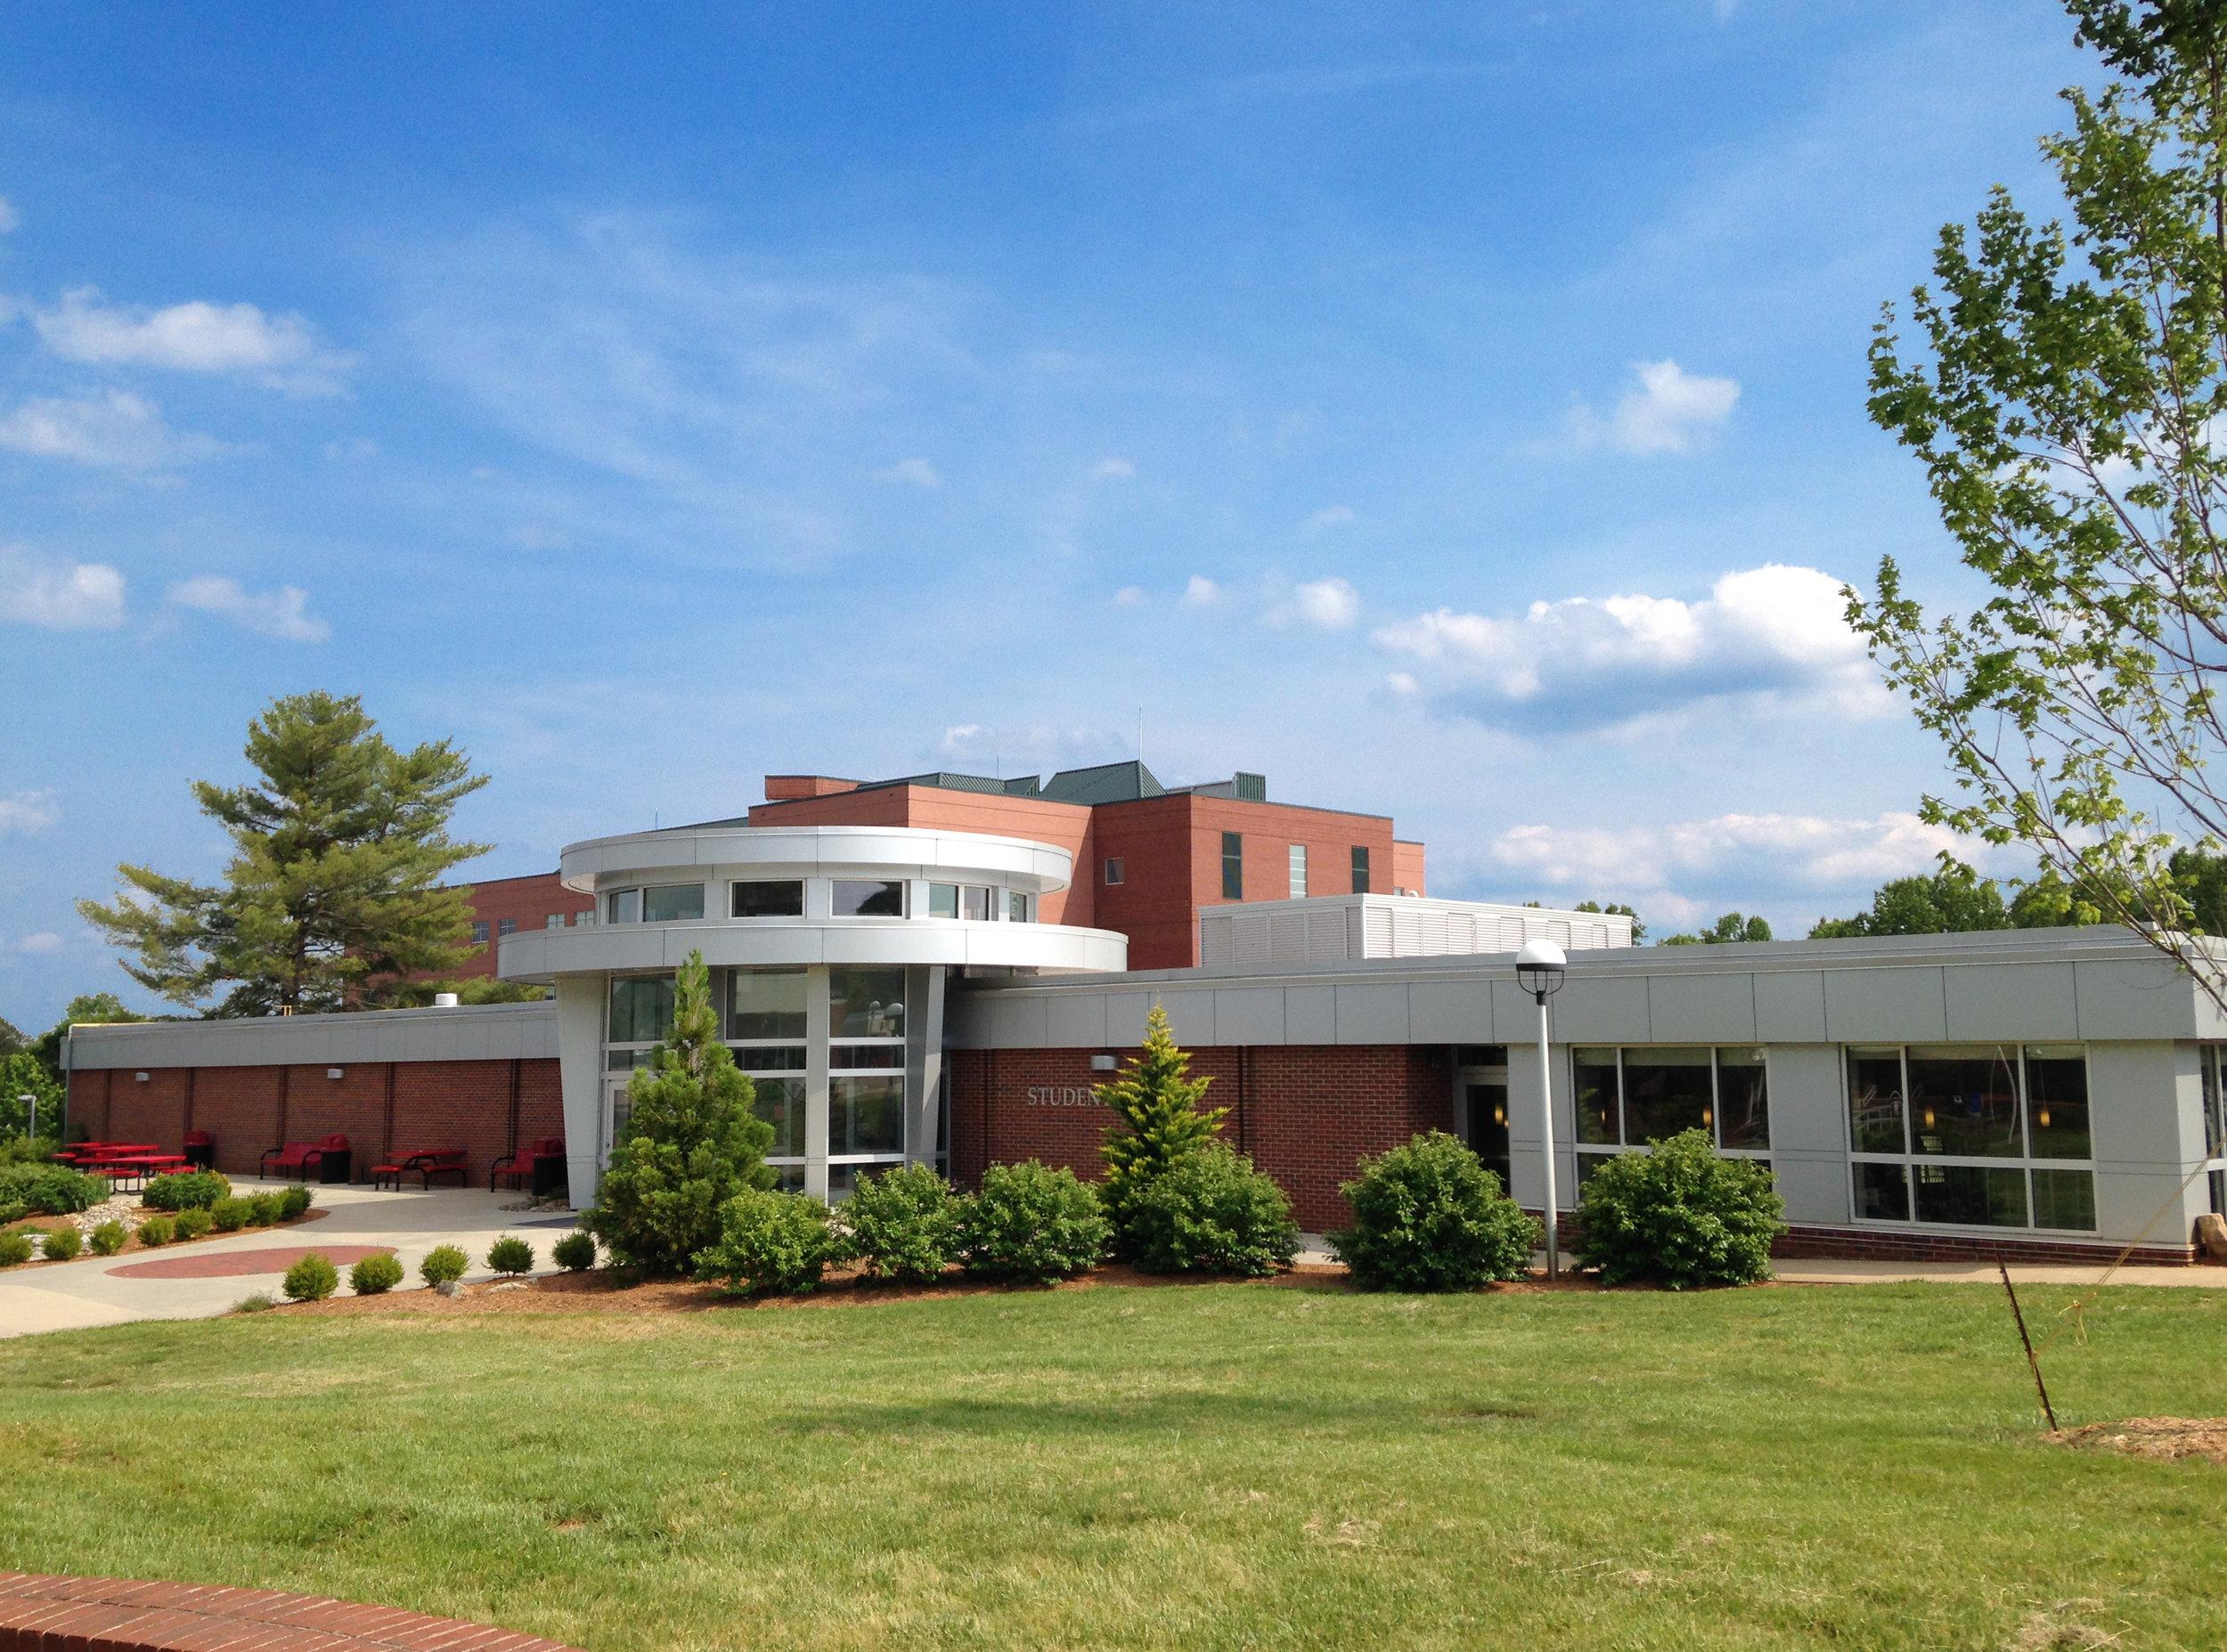 ADW-Higher-Education-CVCC-Hickory-NC-Student-Center-Exterior.jpg